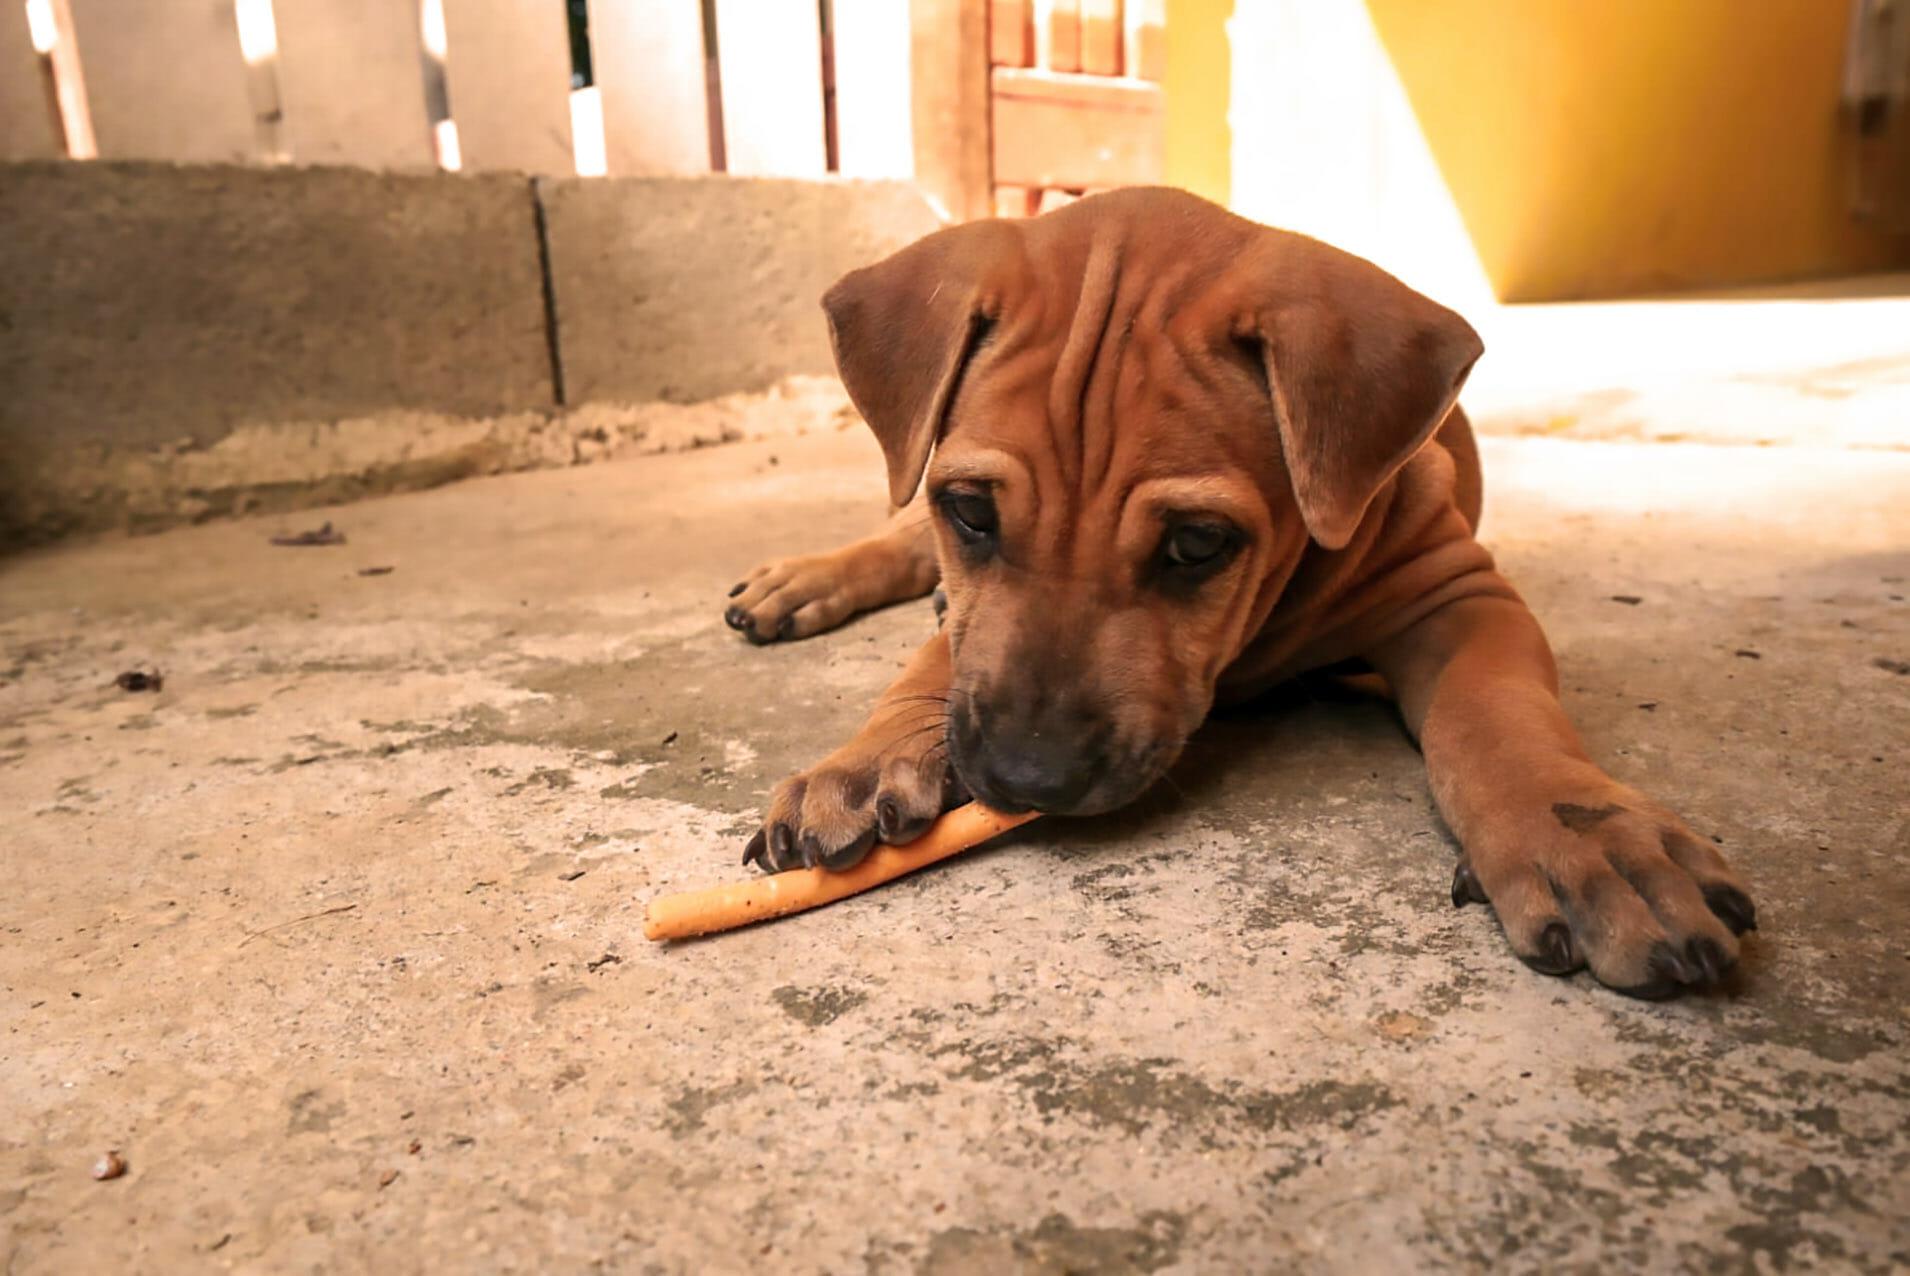 dogsitting, petsitting, housesitting, thailand, koh chang, animal sanctuary, animal rescue, puppy